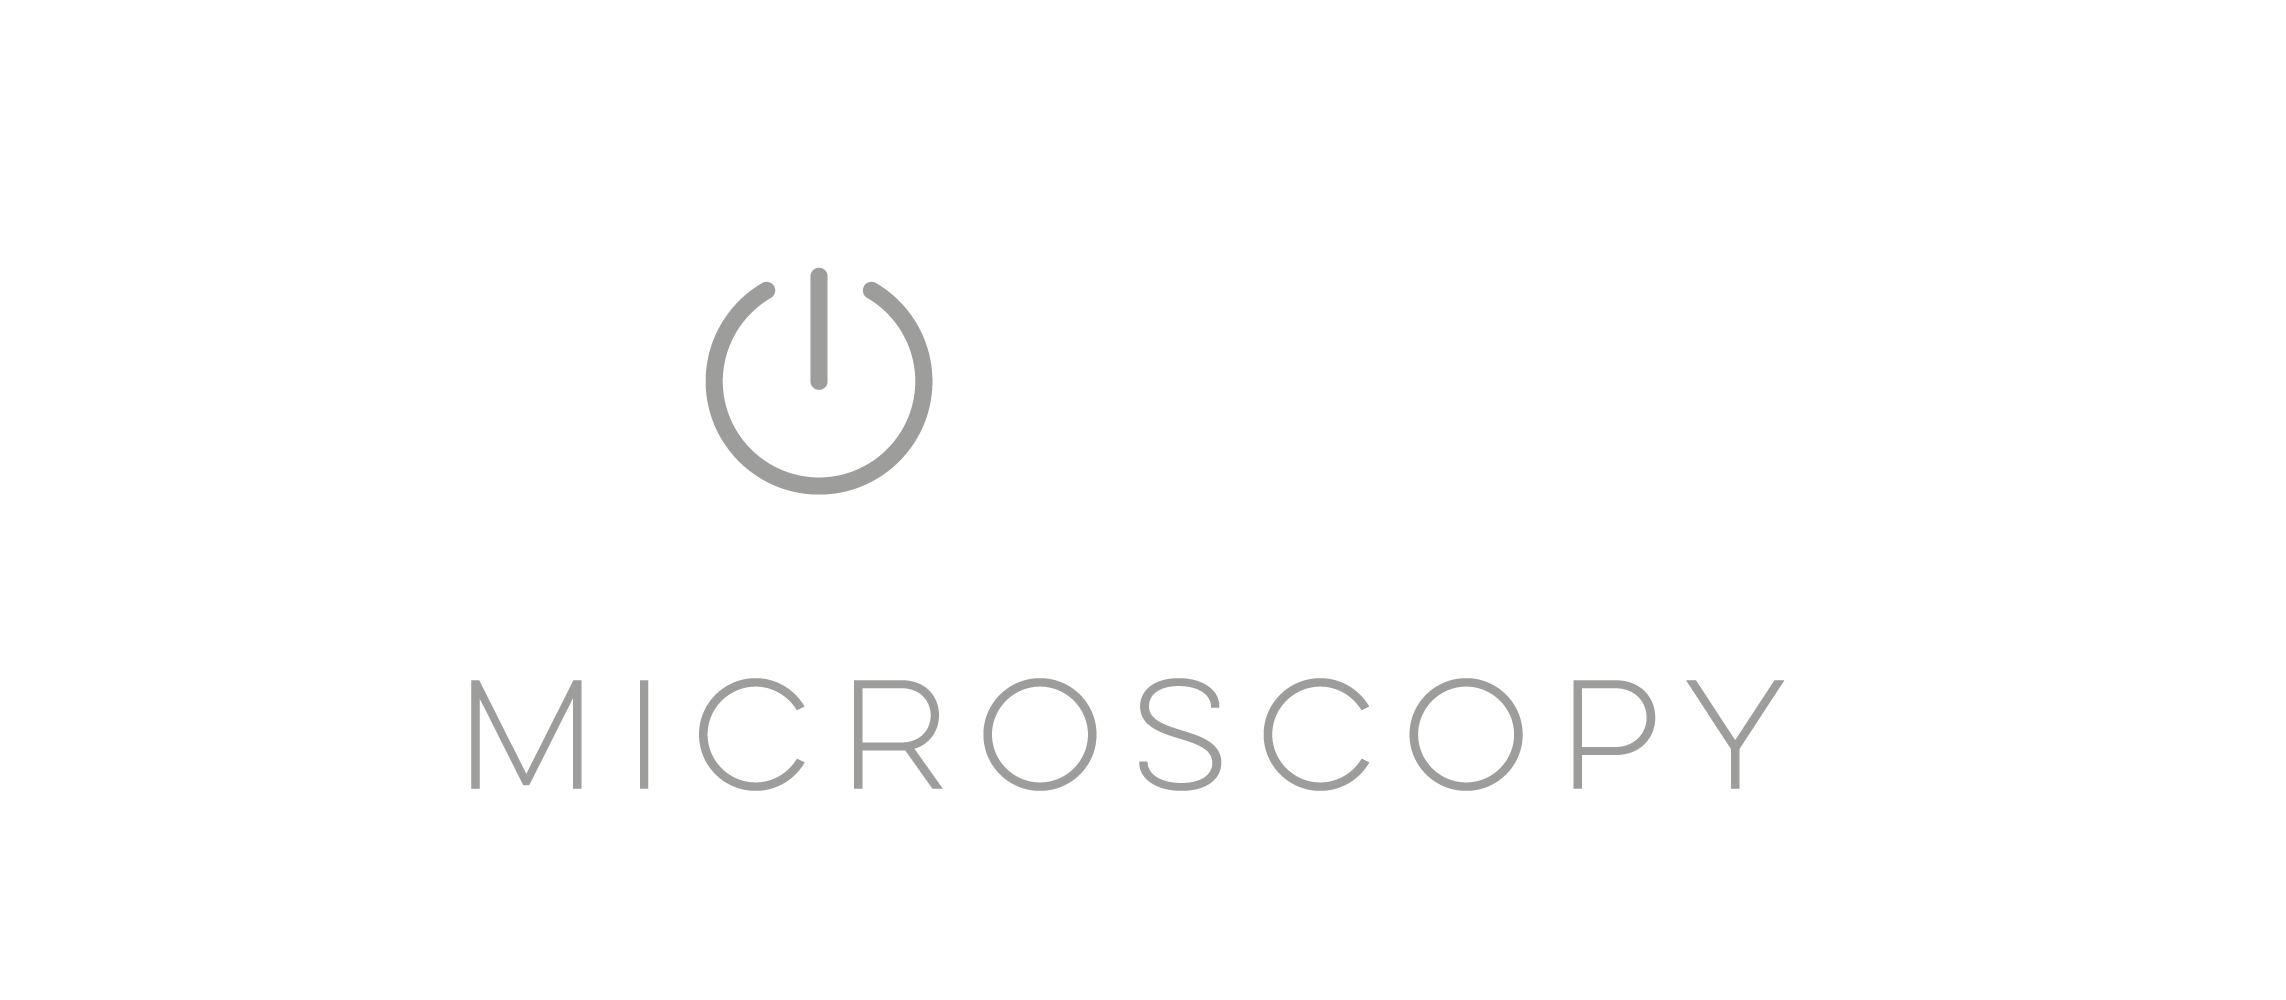 Frontier Microscopy